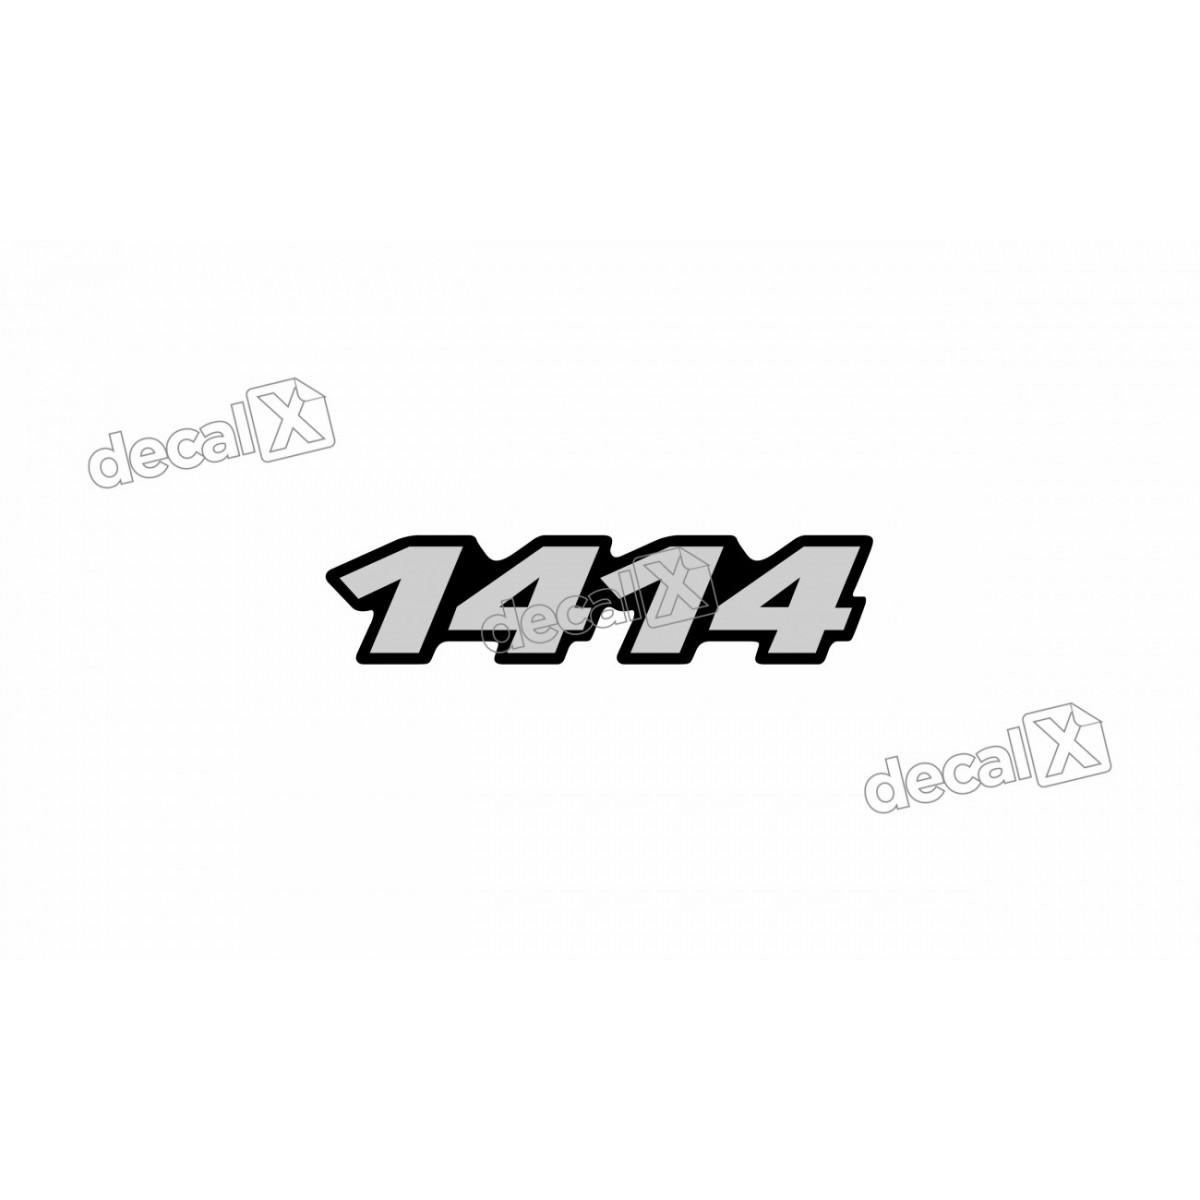 Adesivo Emblema Resinado Mercedes 1414 Cm28 Decalx